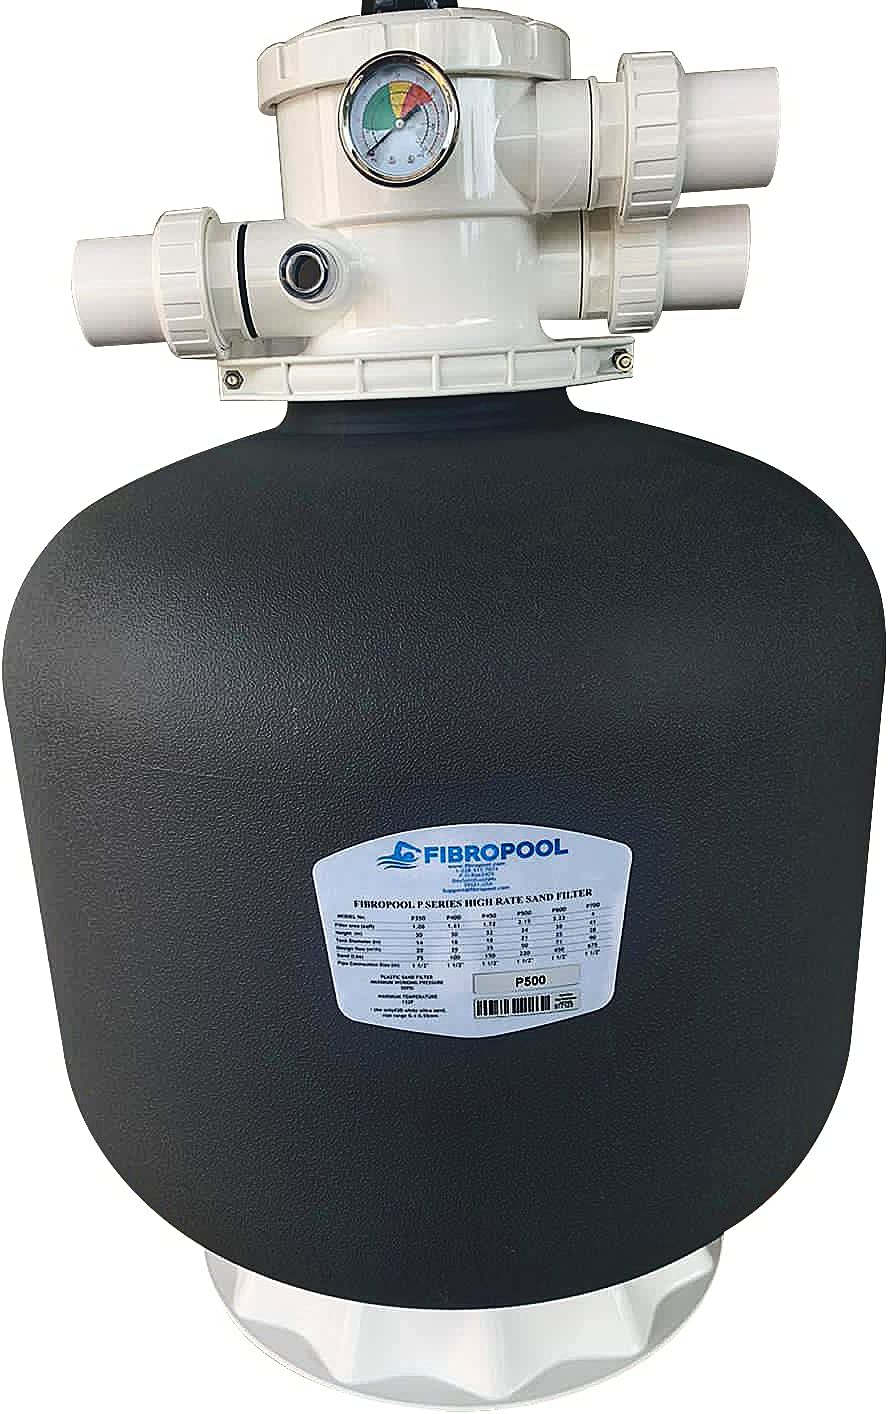 FibroPool Swimming Pool Miami Mall Bargain sale Sand Filter Diameter Lbs 220 Includi 21